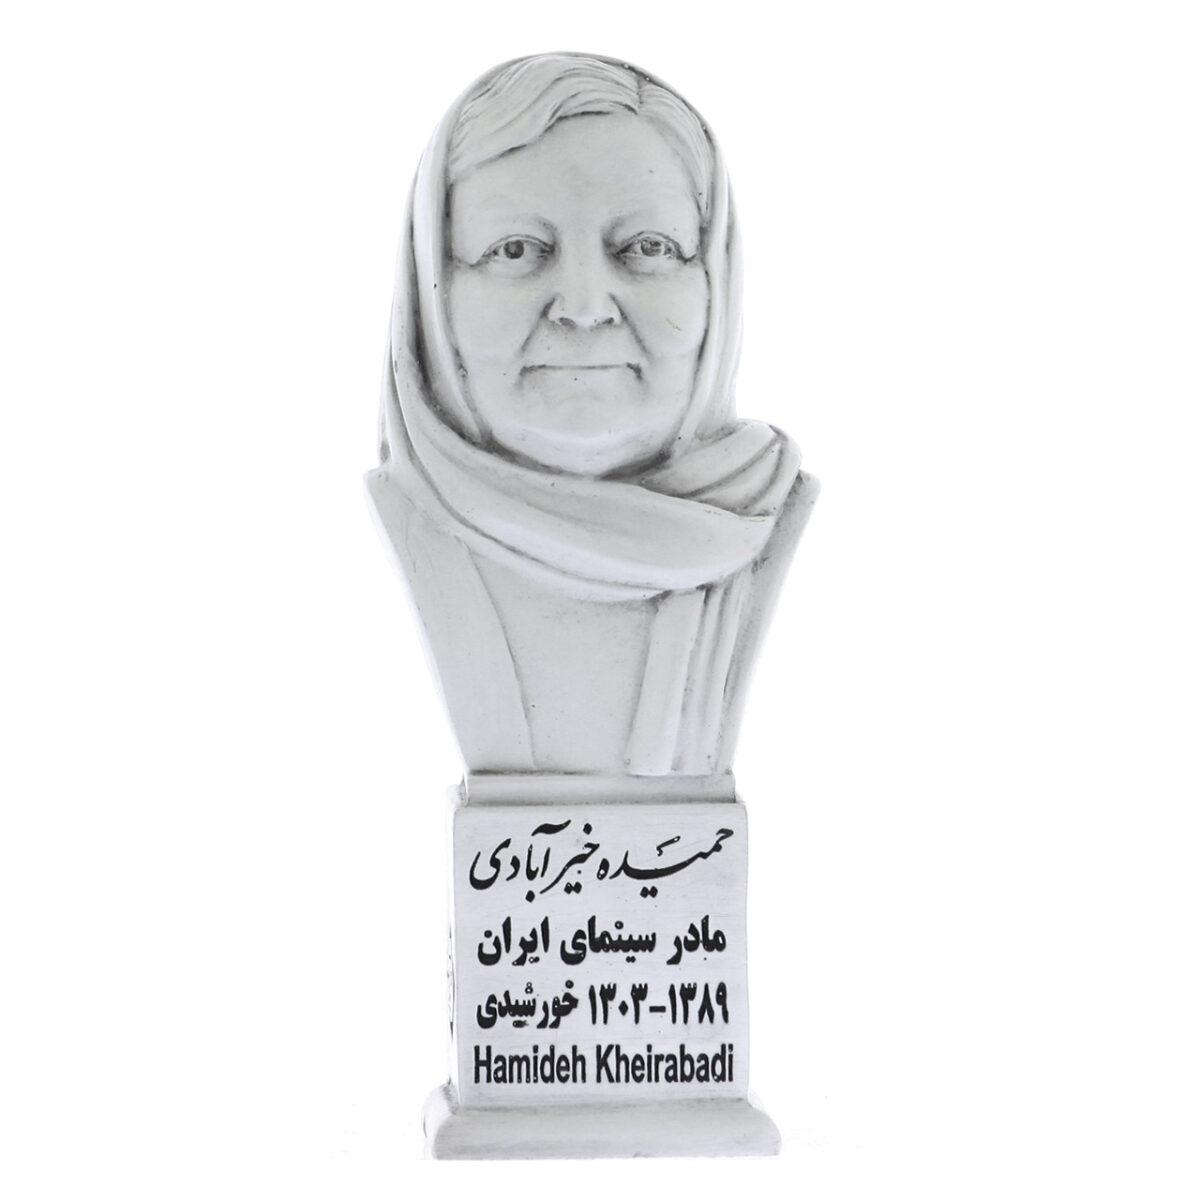 hamideh kheirabadi s 1200x1200 - سردیس خانم حمیده خیر آبادی